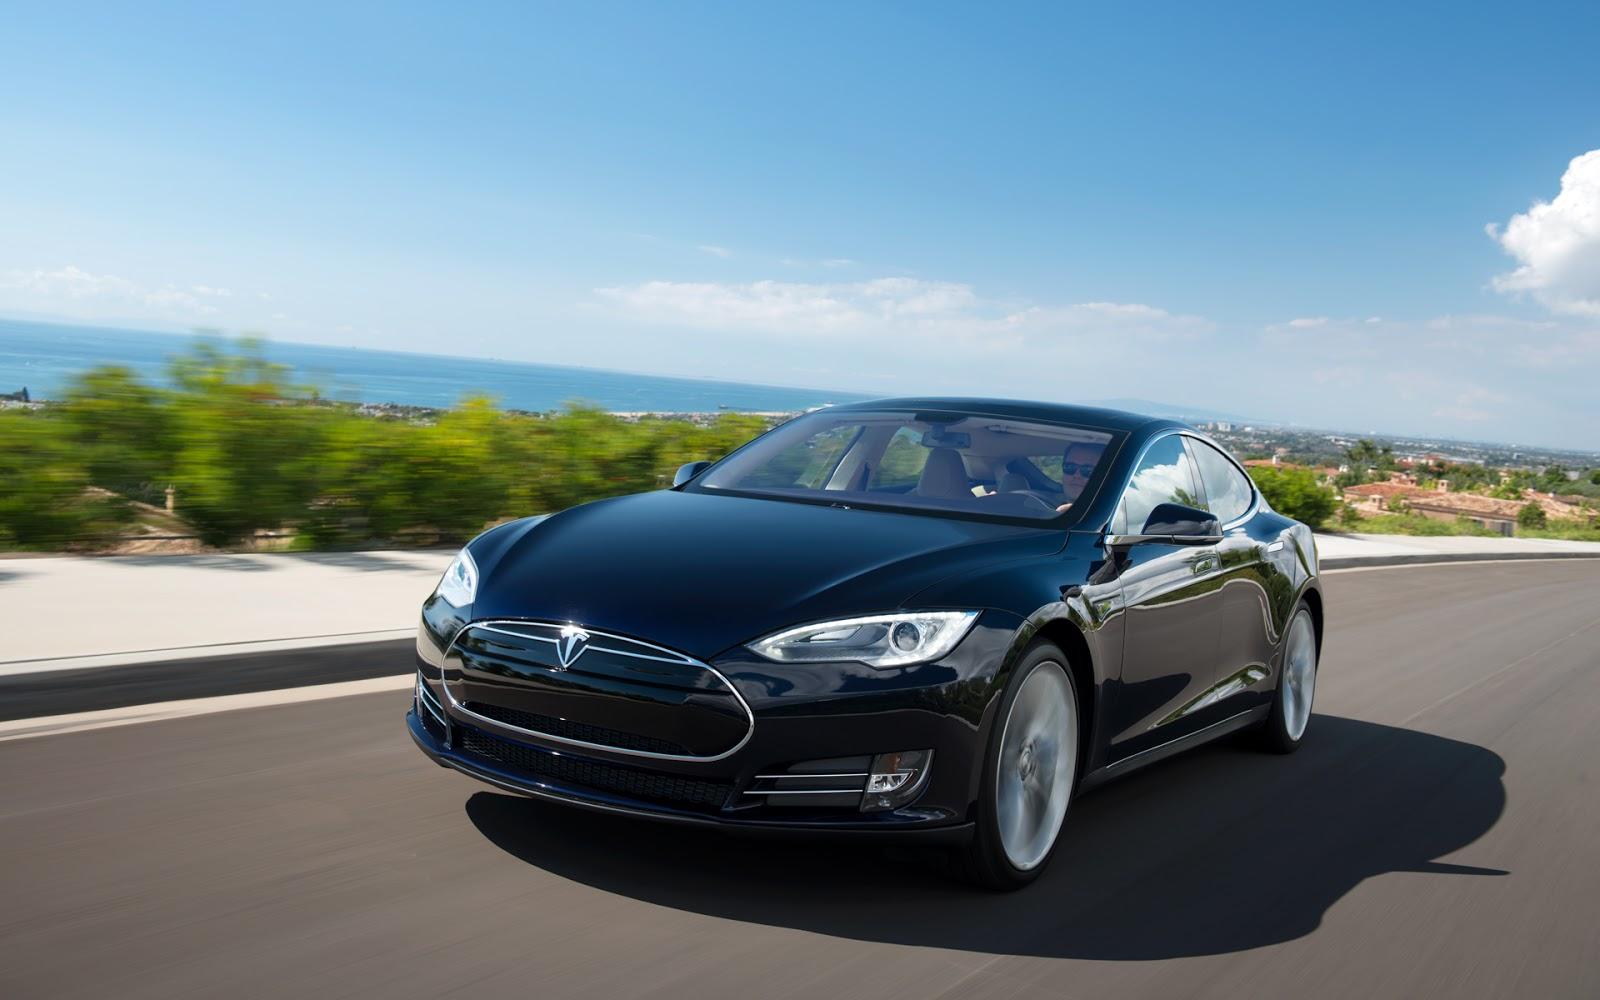 Cars Tesla Model S Electric Eco Sedan Car Photos Wallpapers 1600x1000